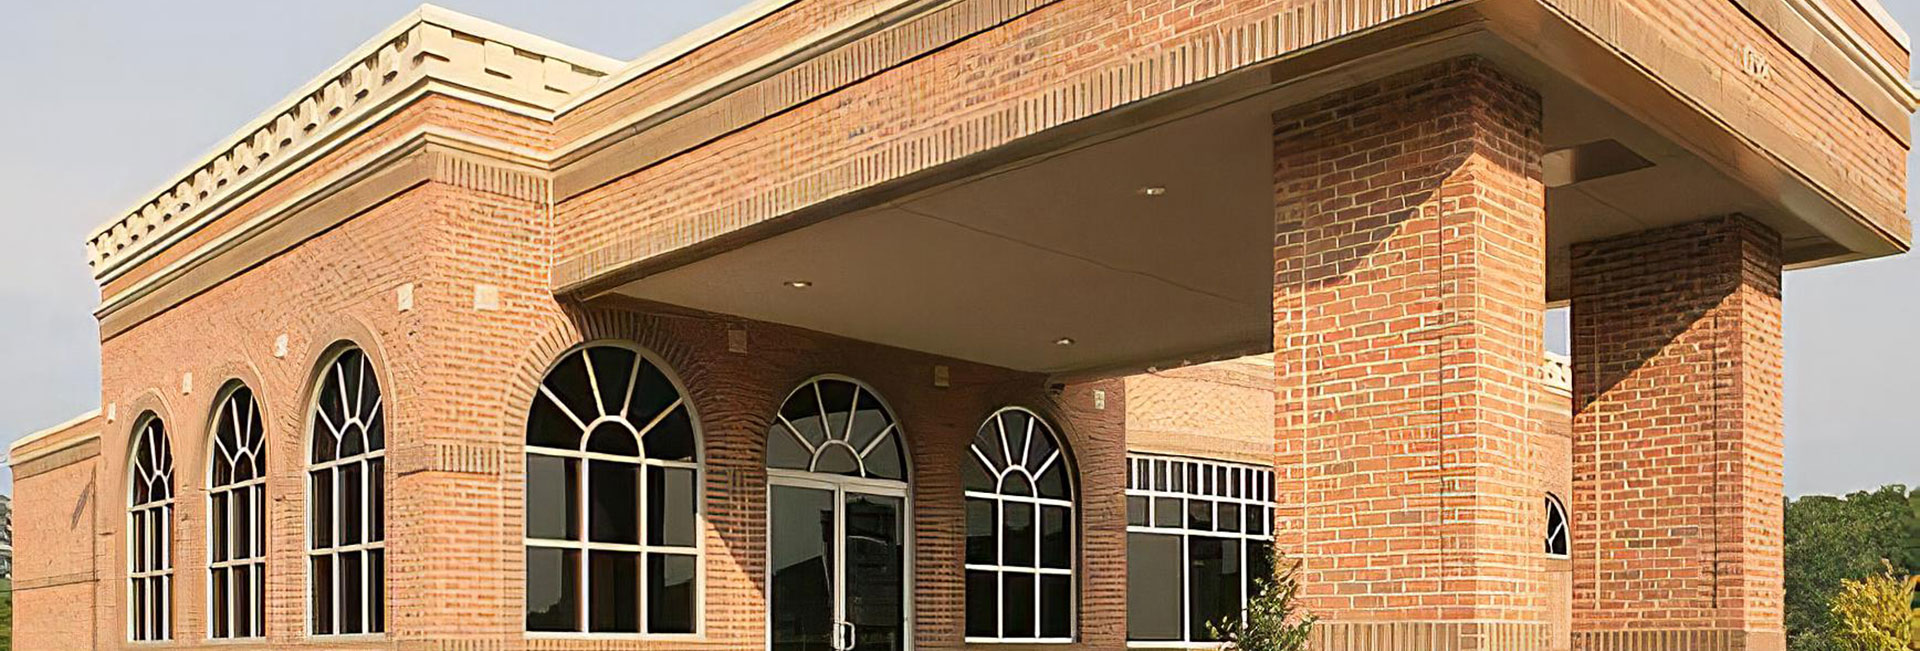 Bank exterior